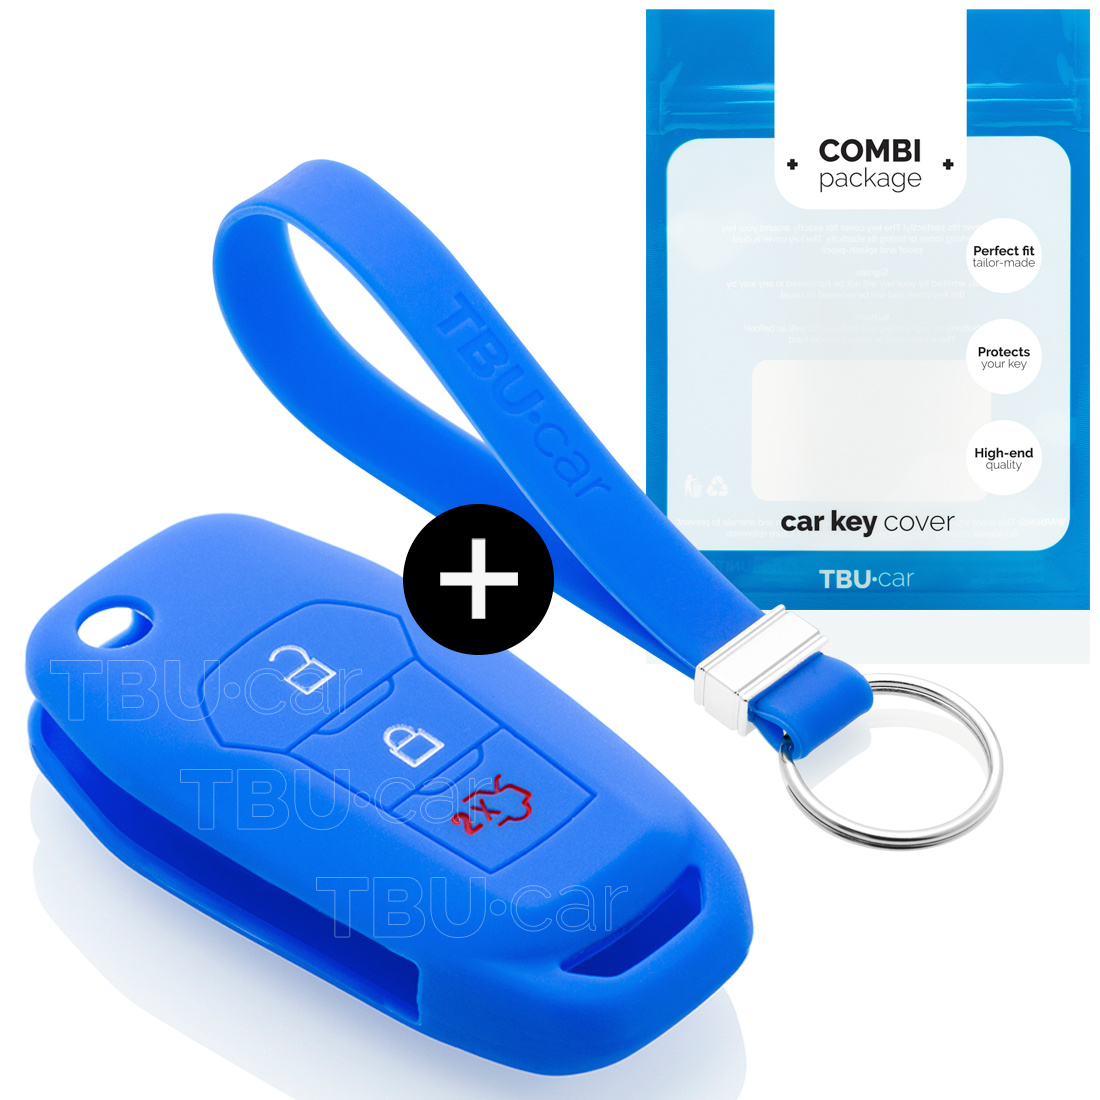 Ford Car key cover - Azul